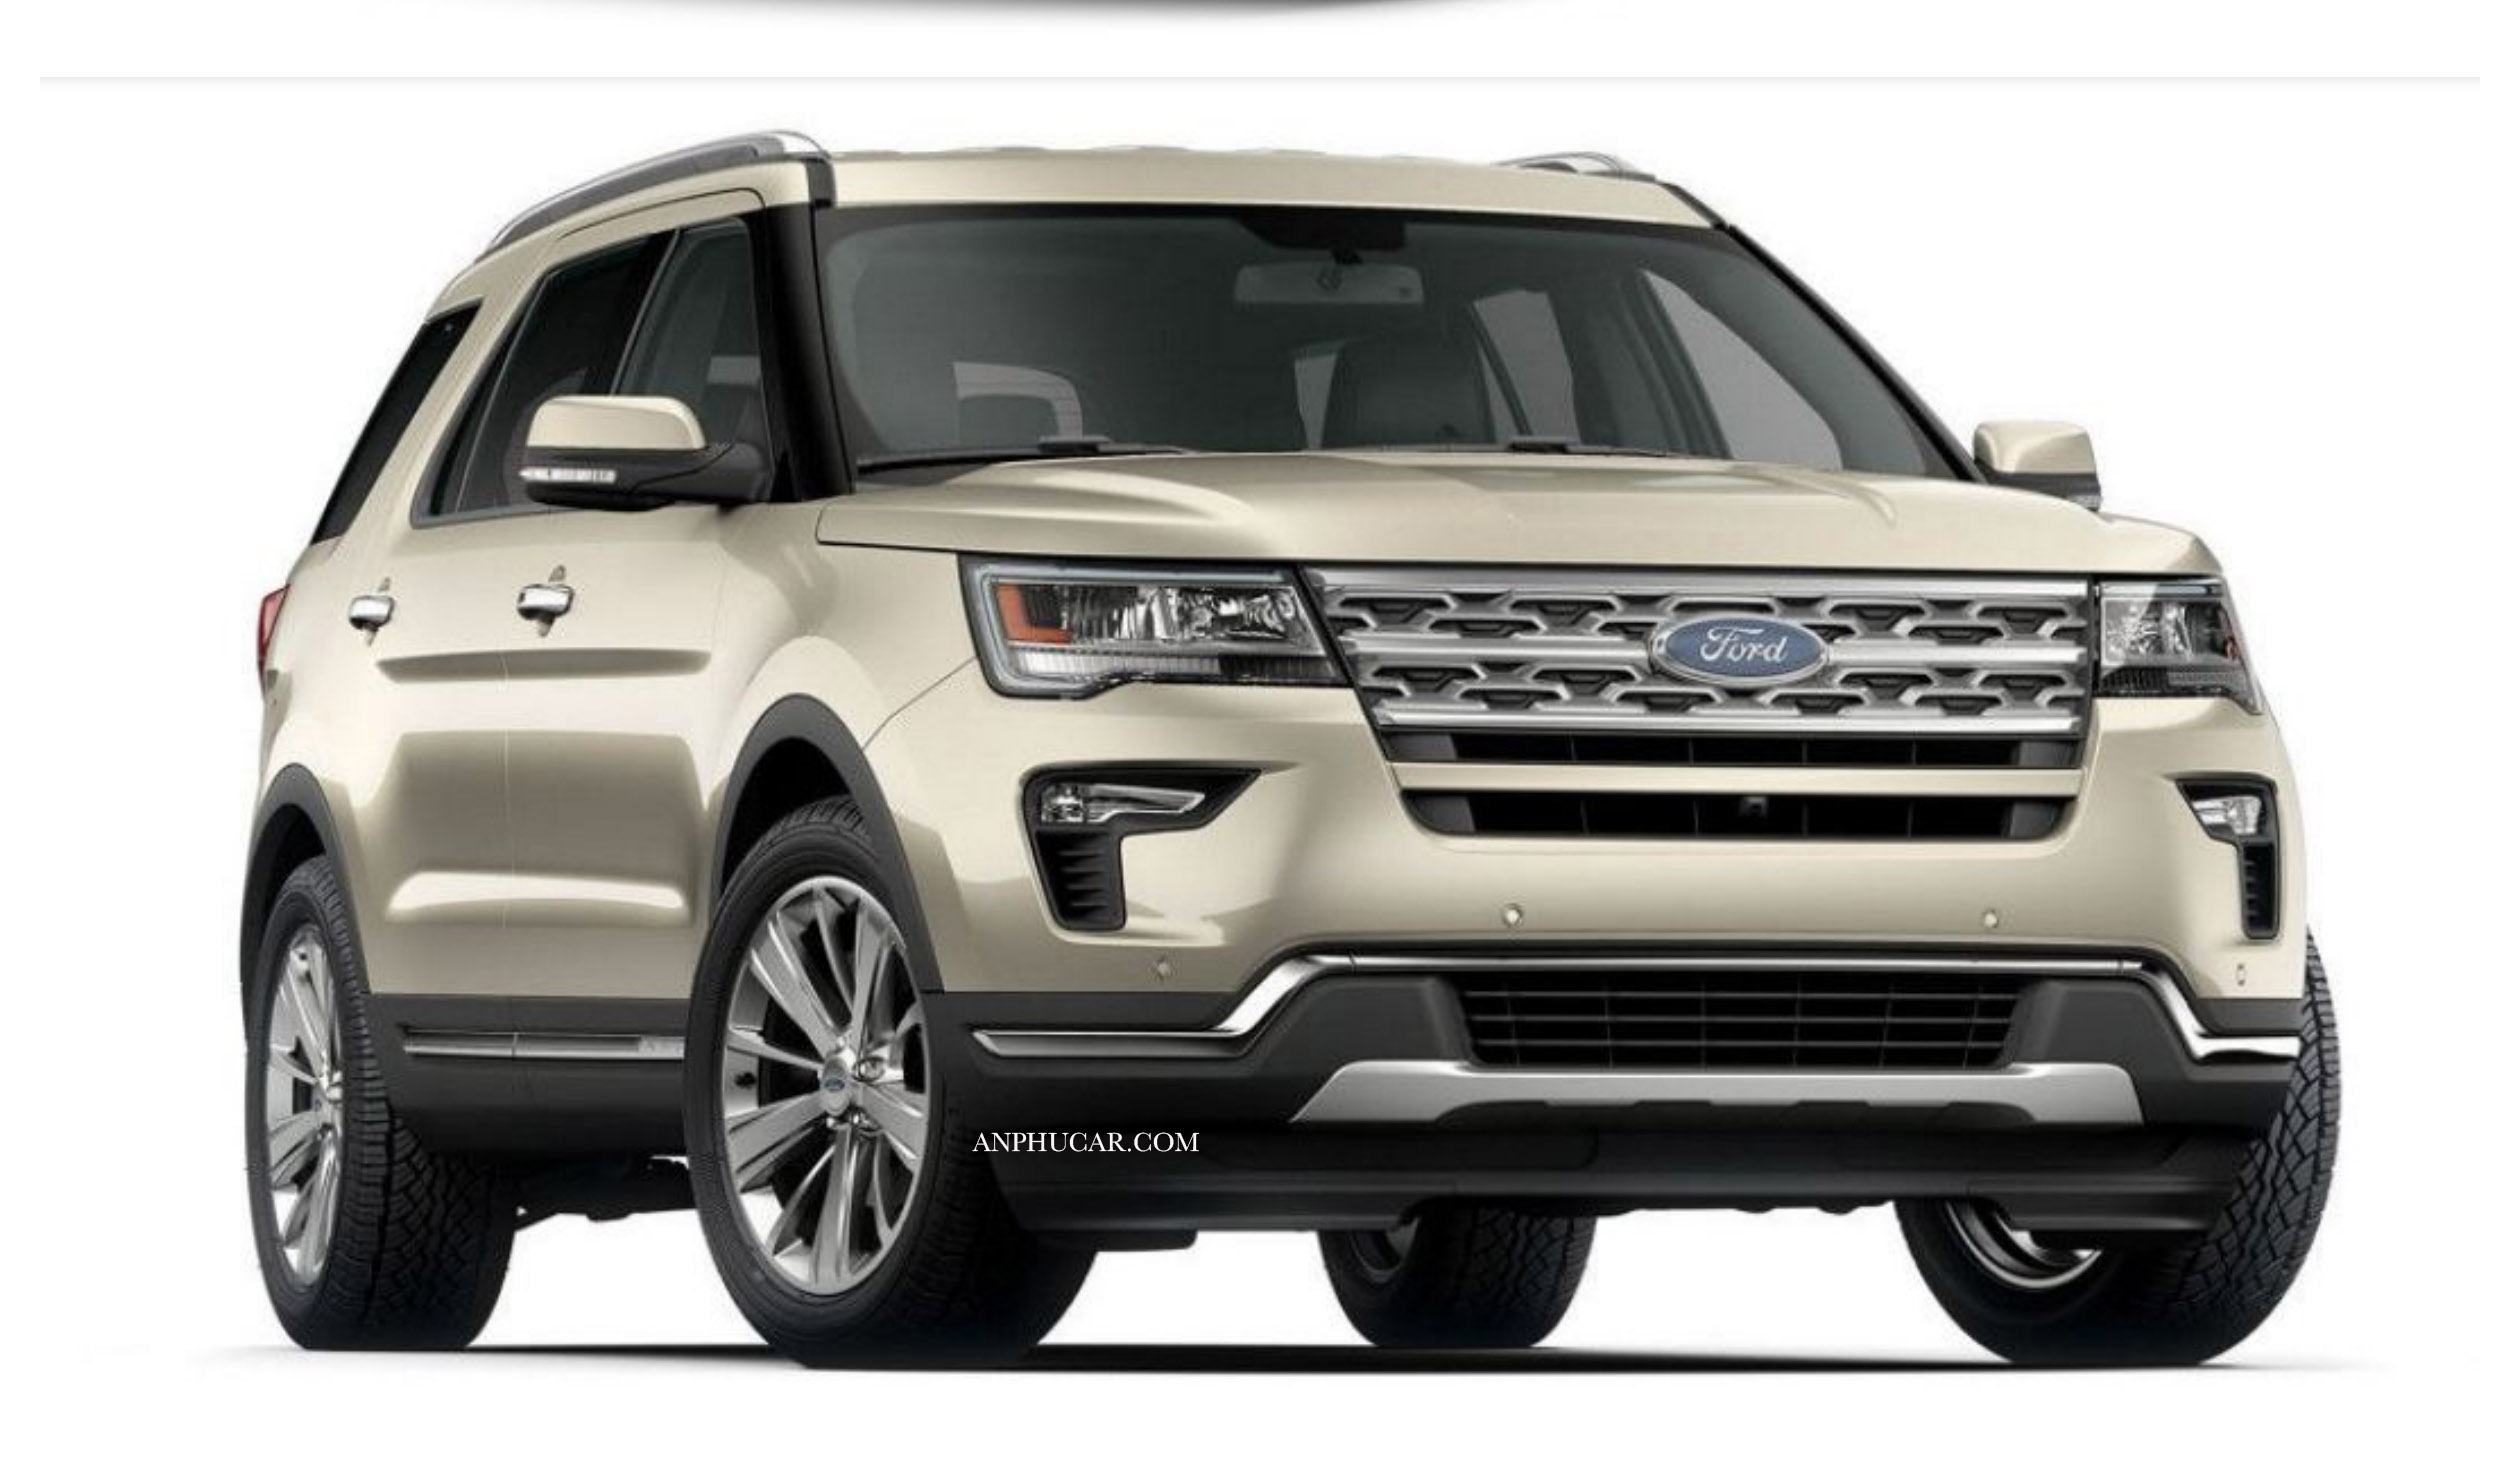 Giá xe Ford Explorer 2019